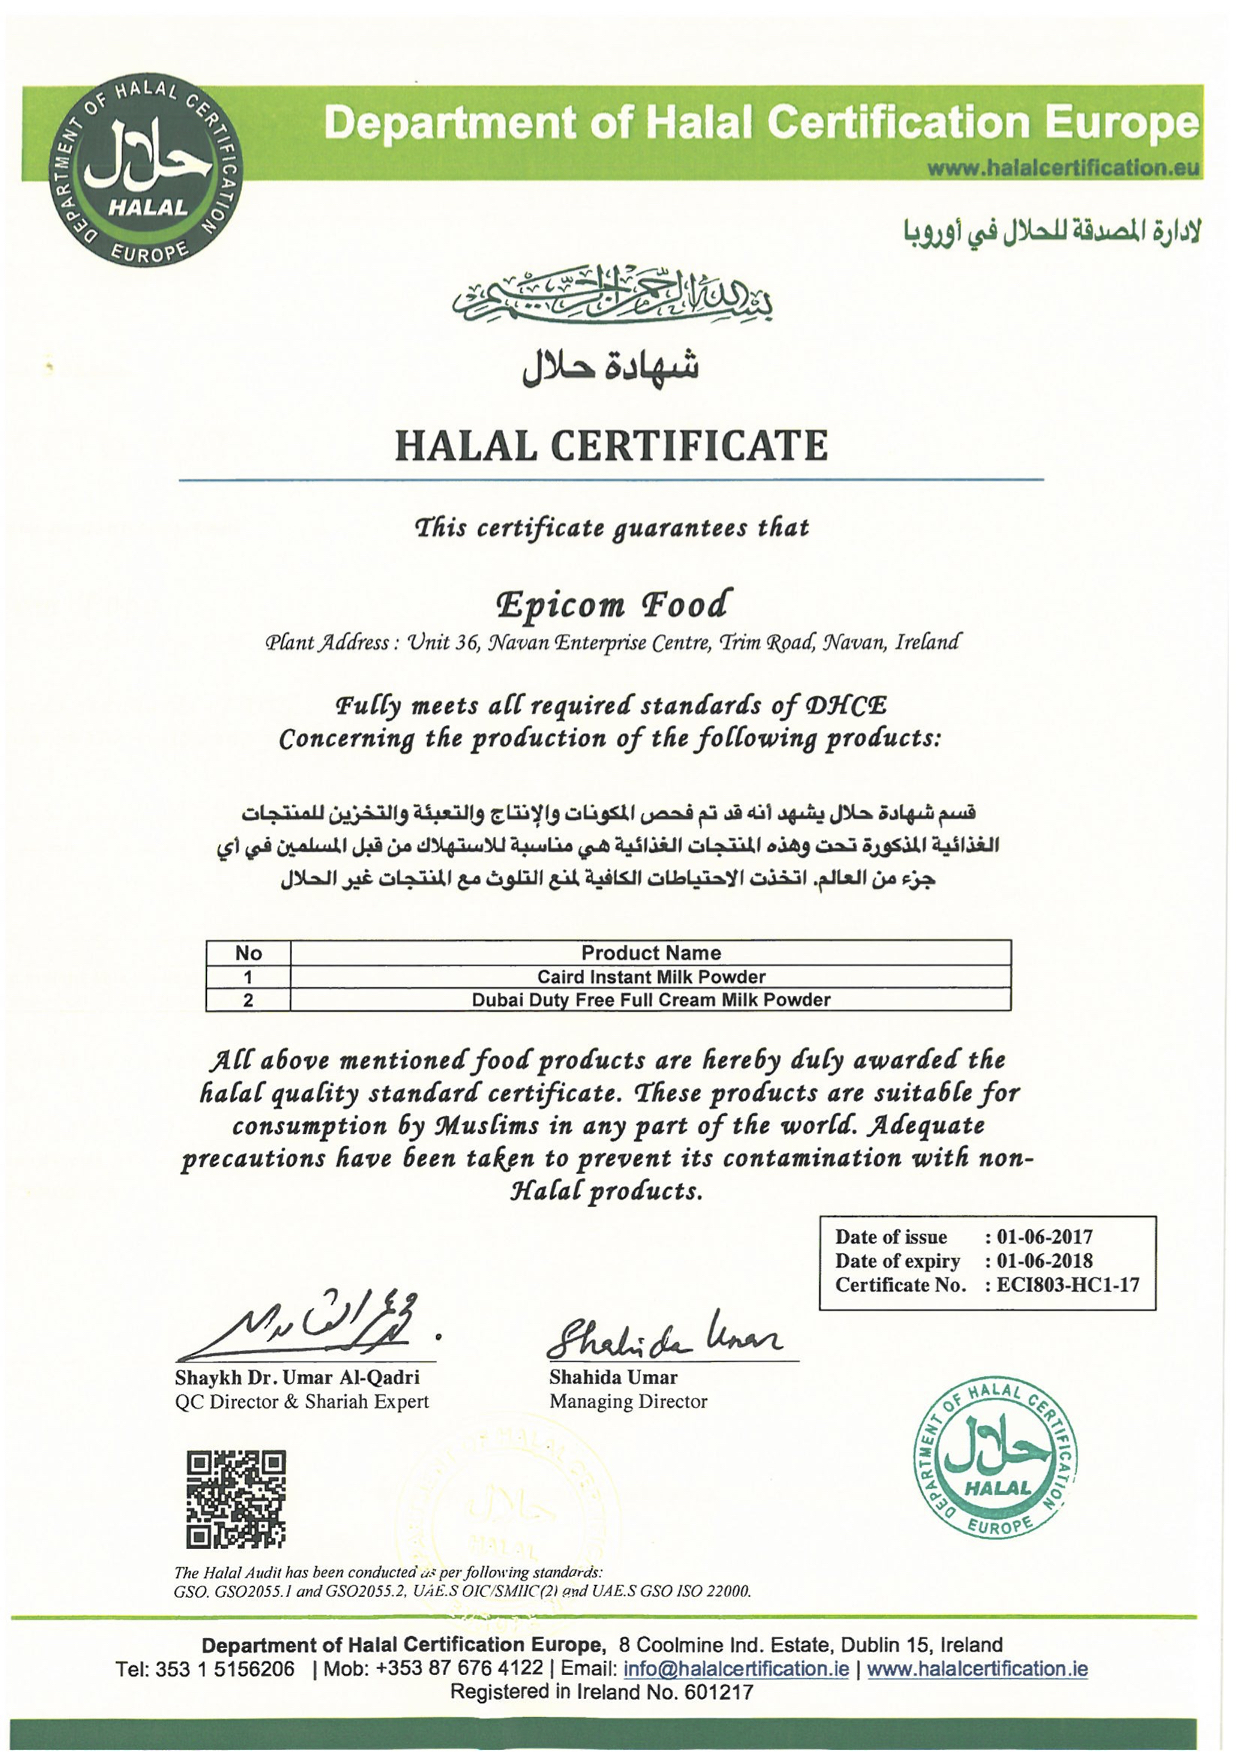 Epicom Ireland Ltd Halal Certificates 2017 Department Of Halal